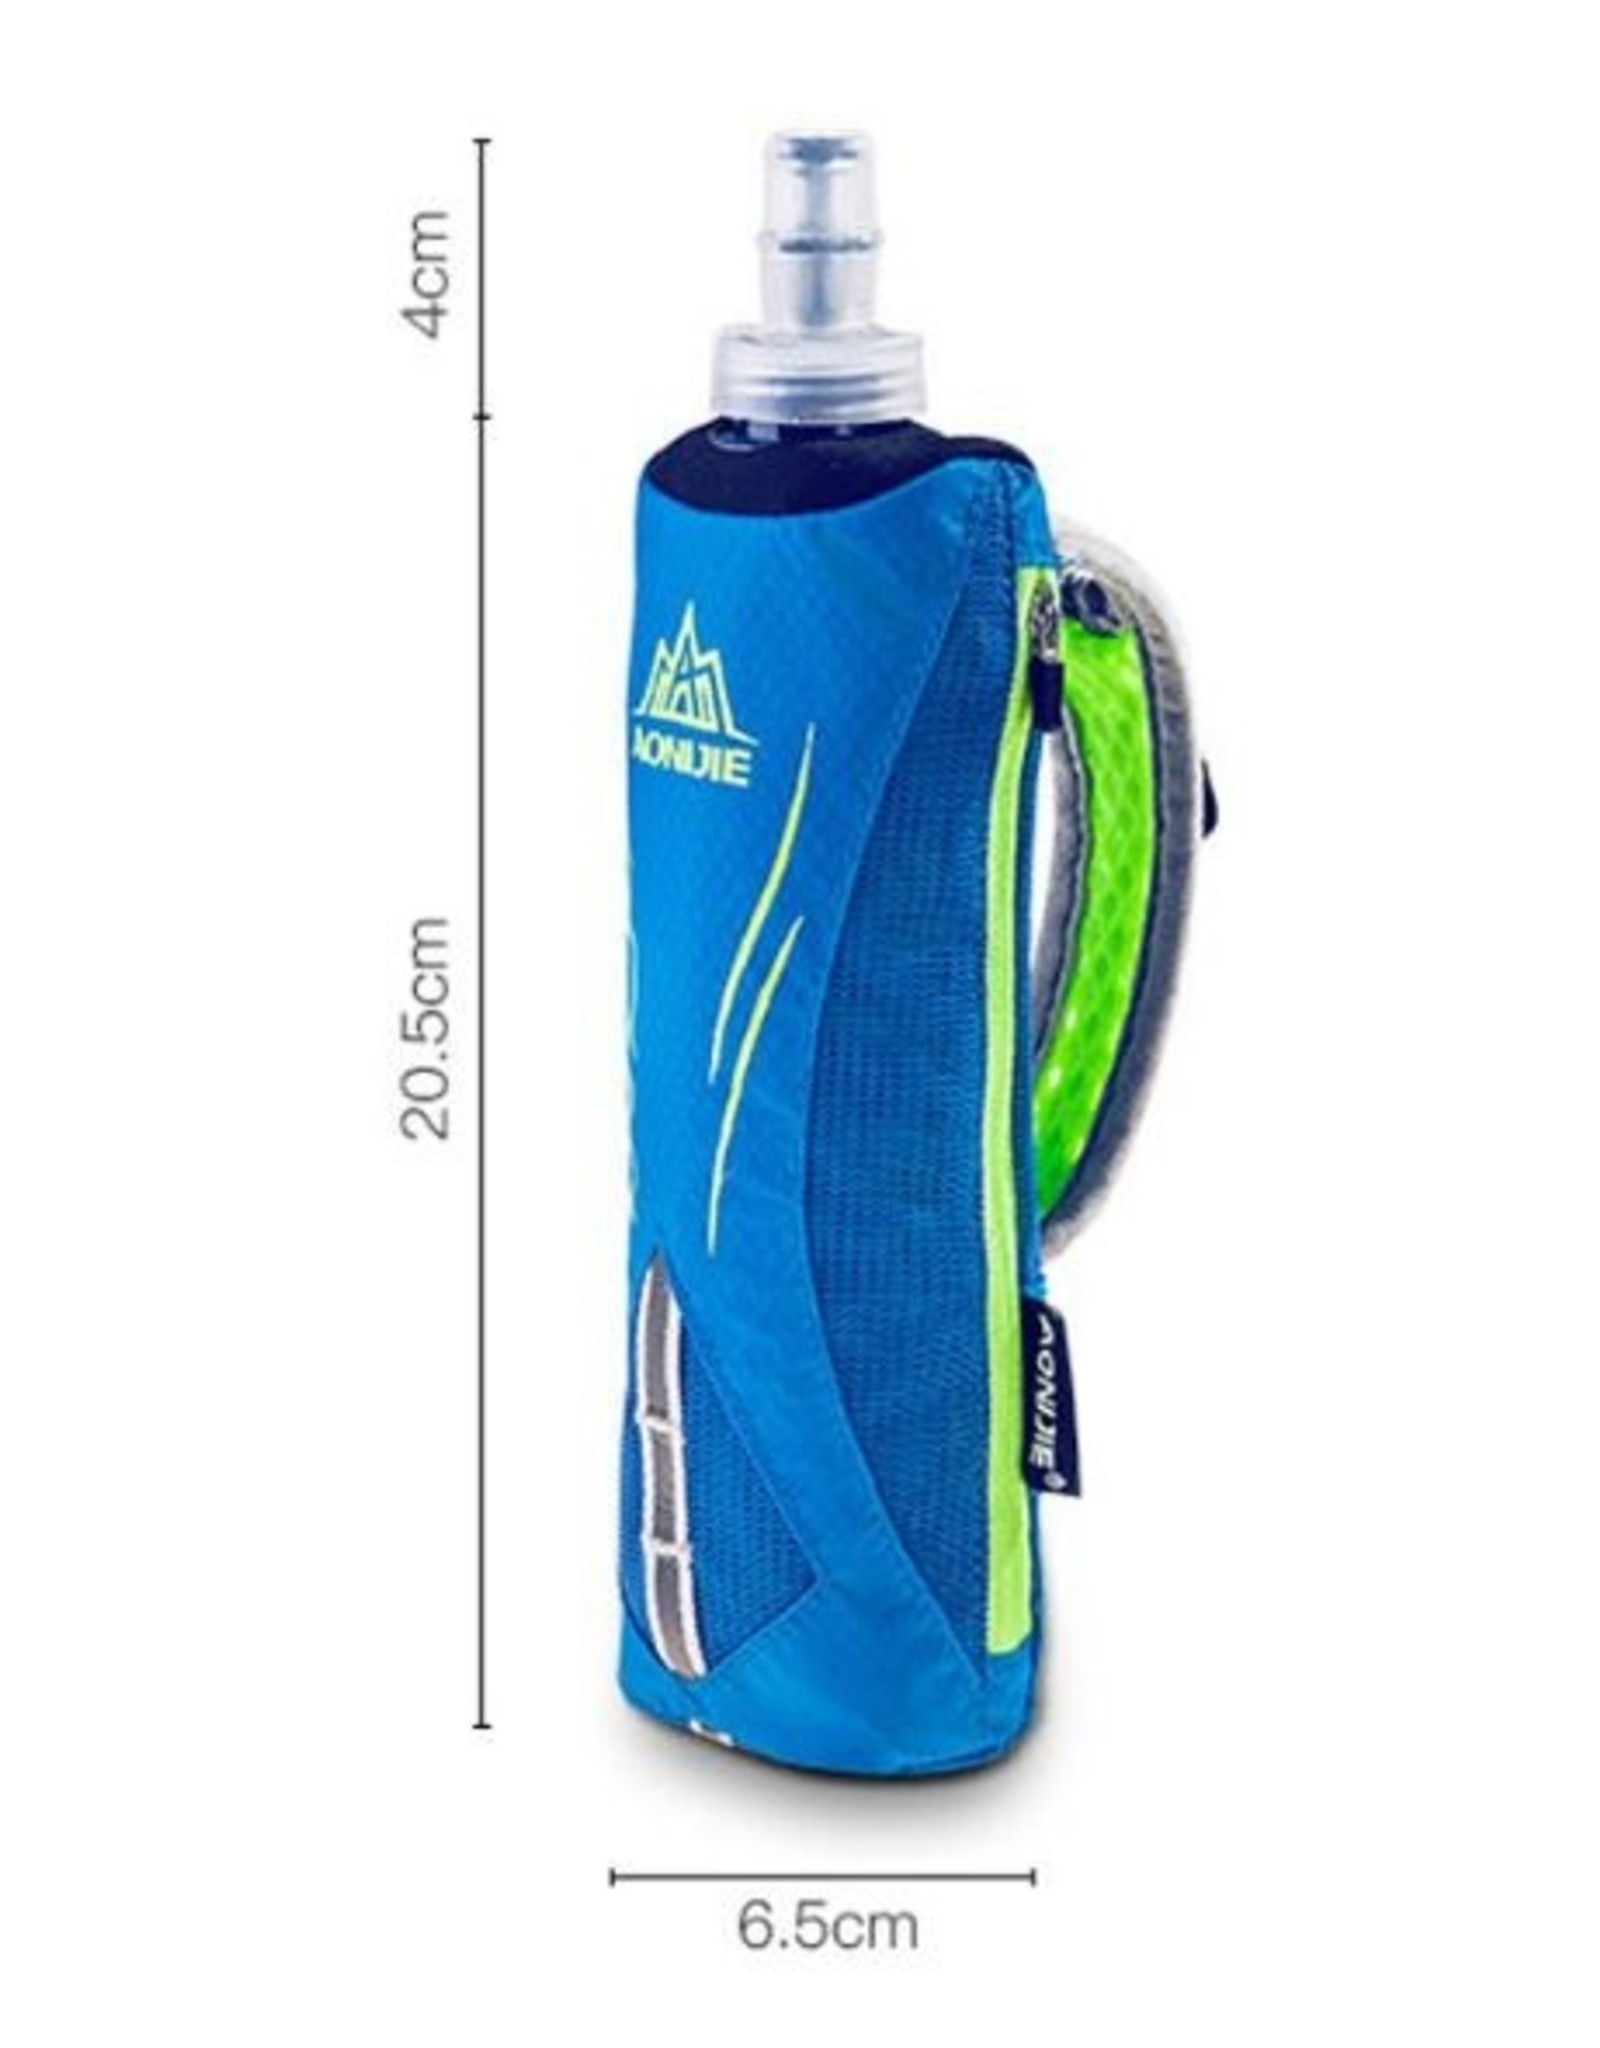 Hardloopbidon, handbidon, drinkfles met telefoon-, geld- en sleutels vakjes | Hardloopfles| Sportfles